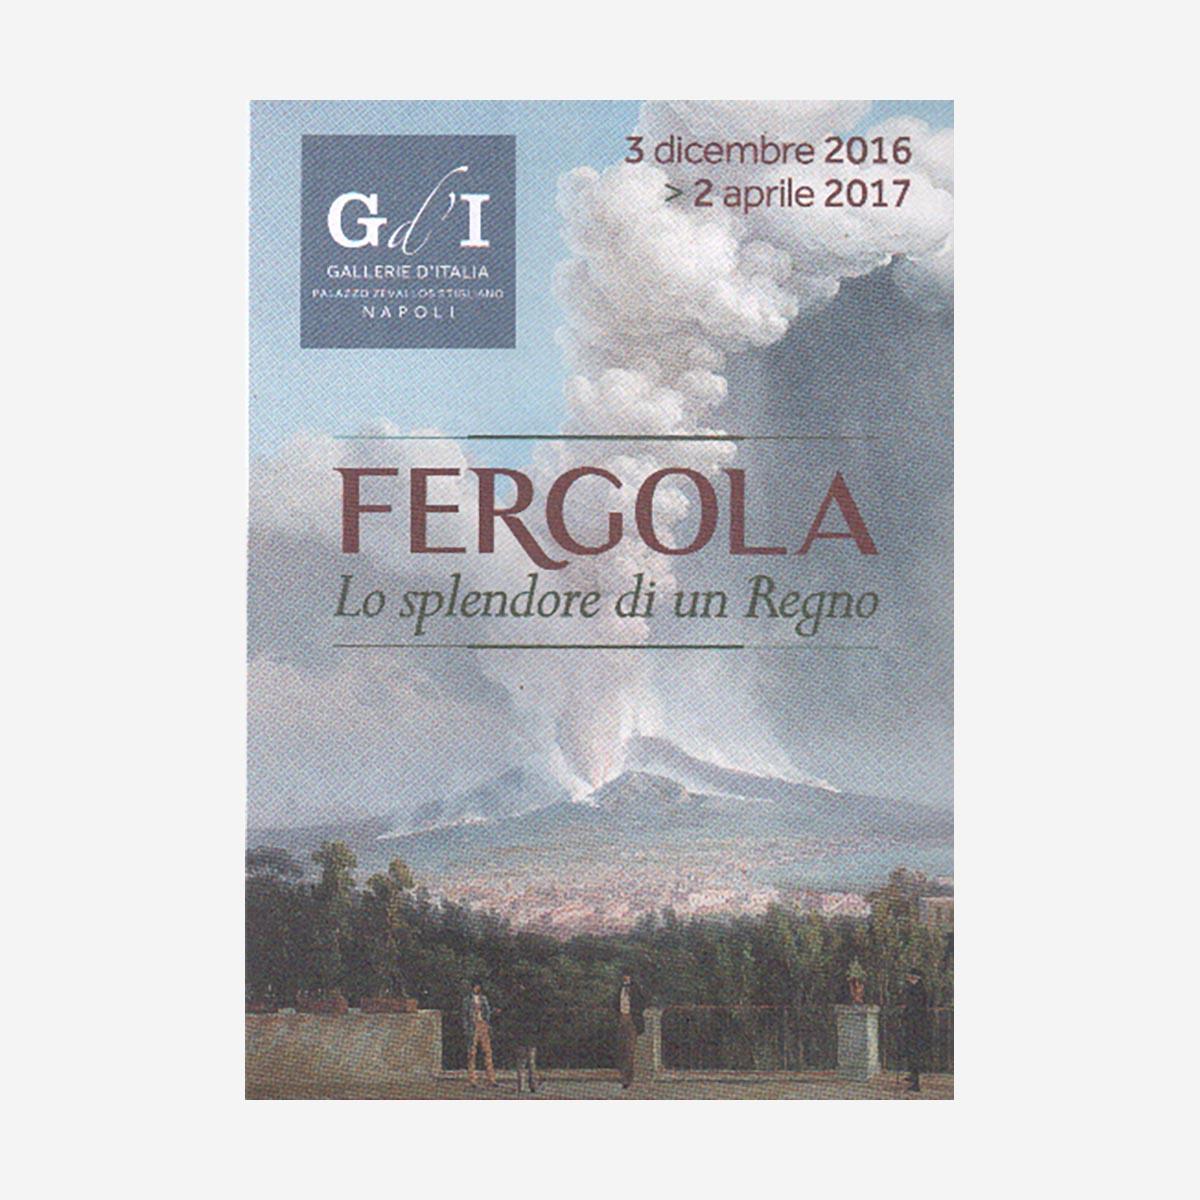 Fergola_Intesa_Sanpaolo